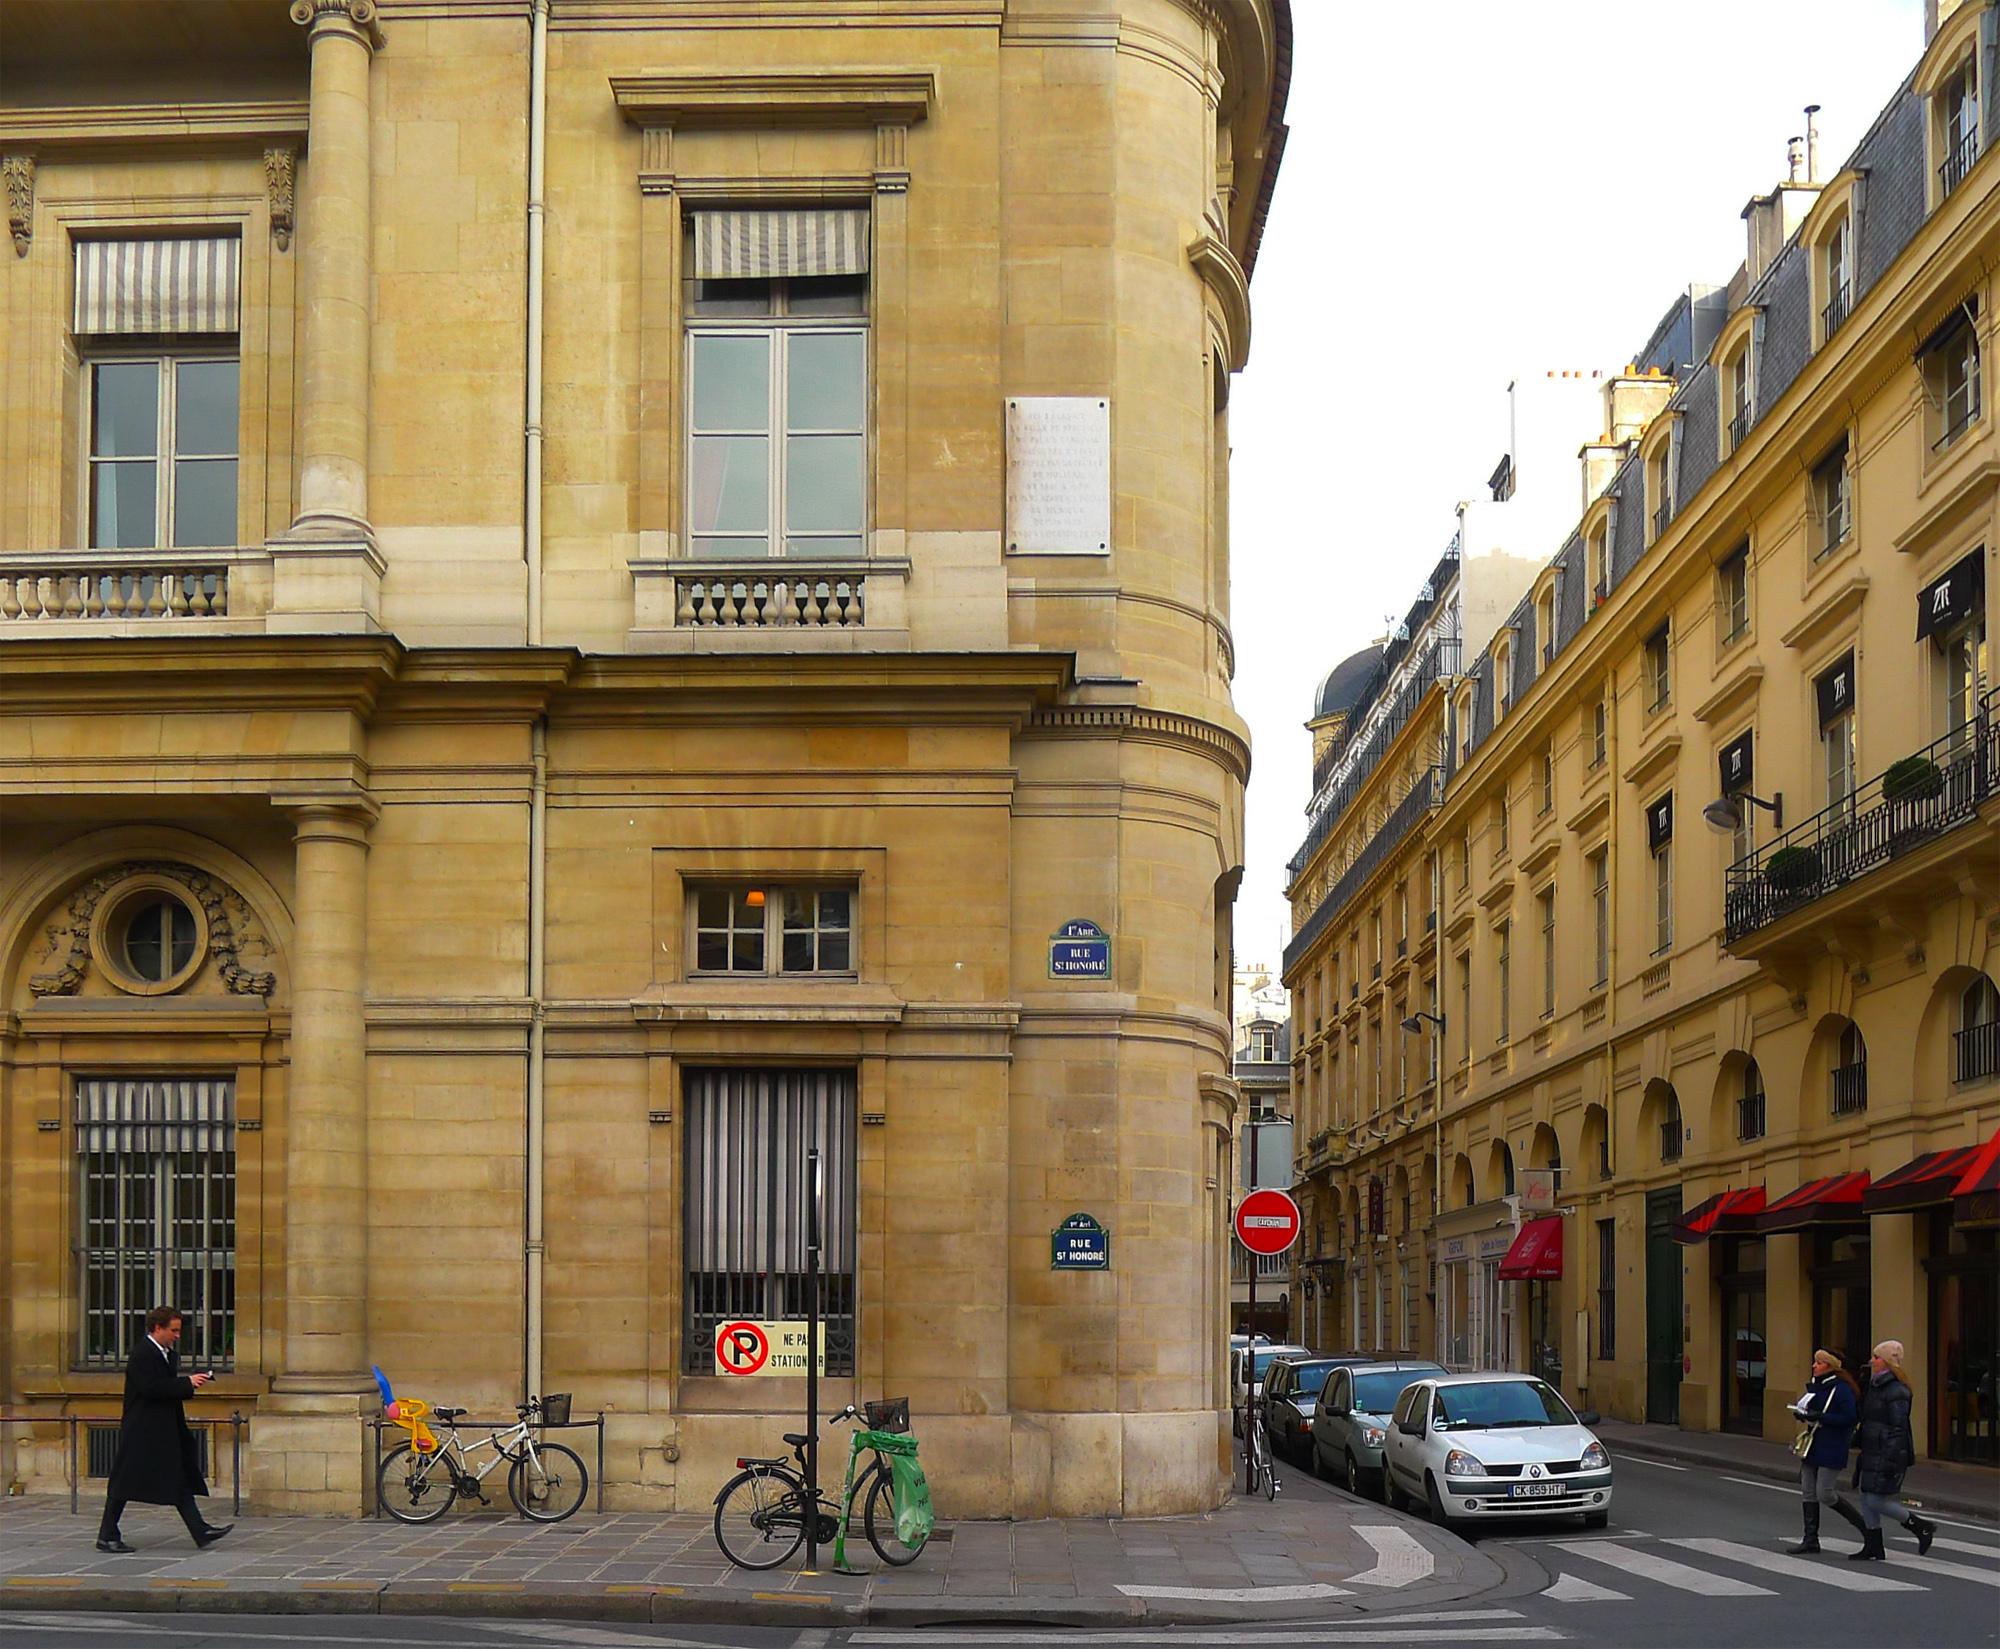 file p1150932 paris ier rue saint honor n202. Black Bedroom Furniture Sets. Home Design Ideas